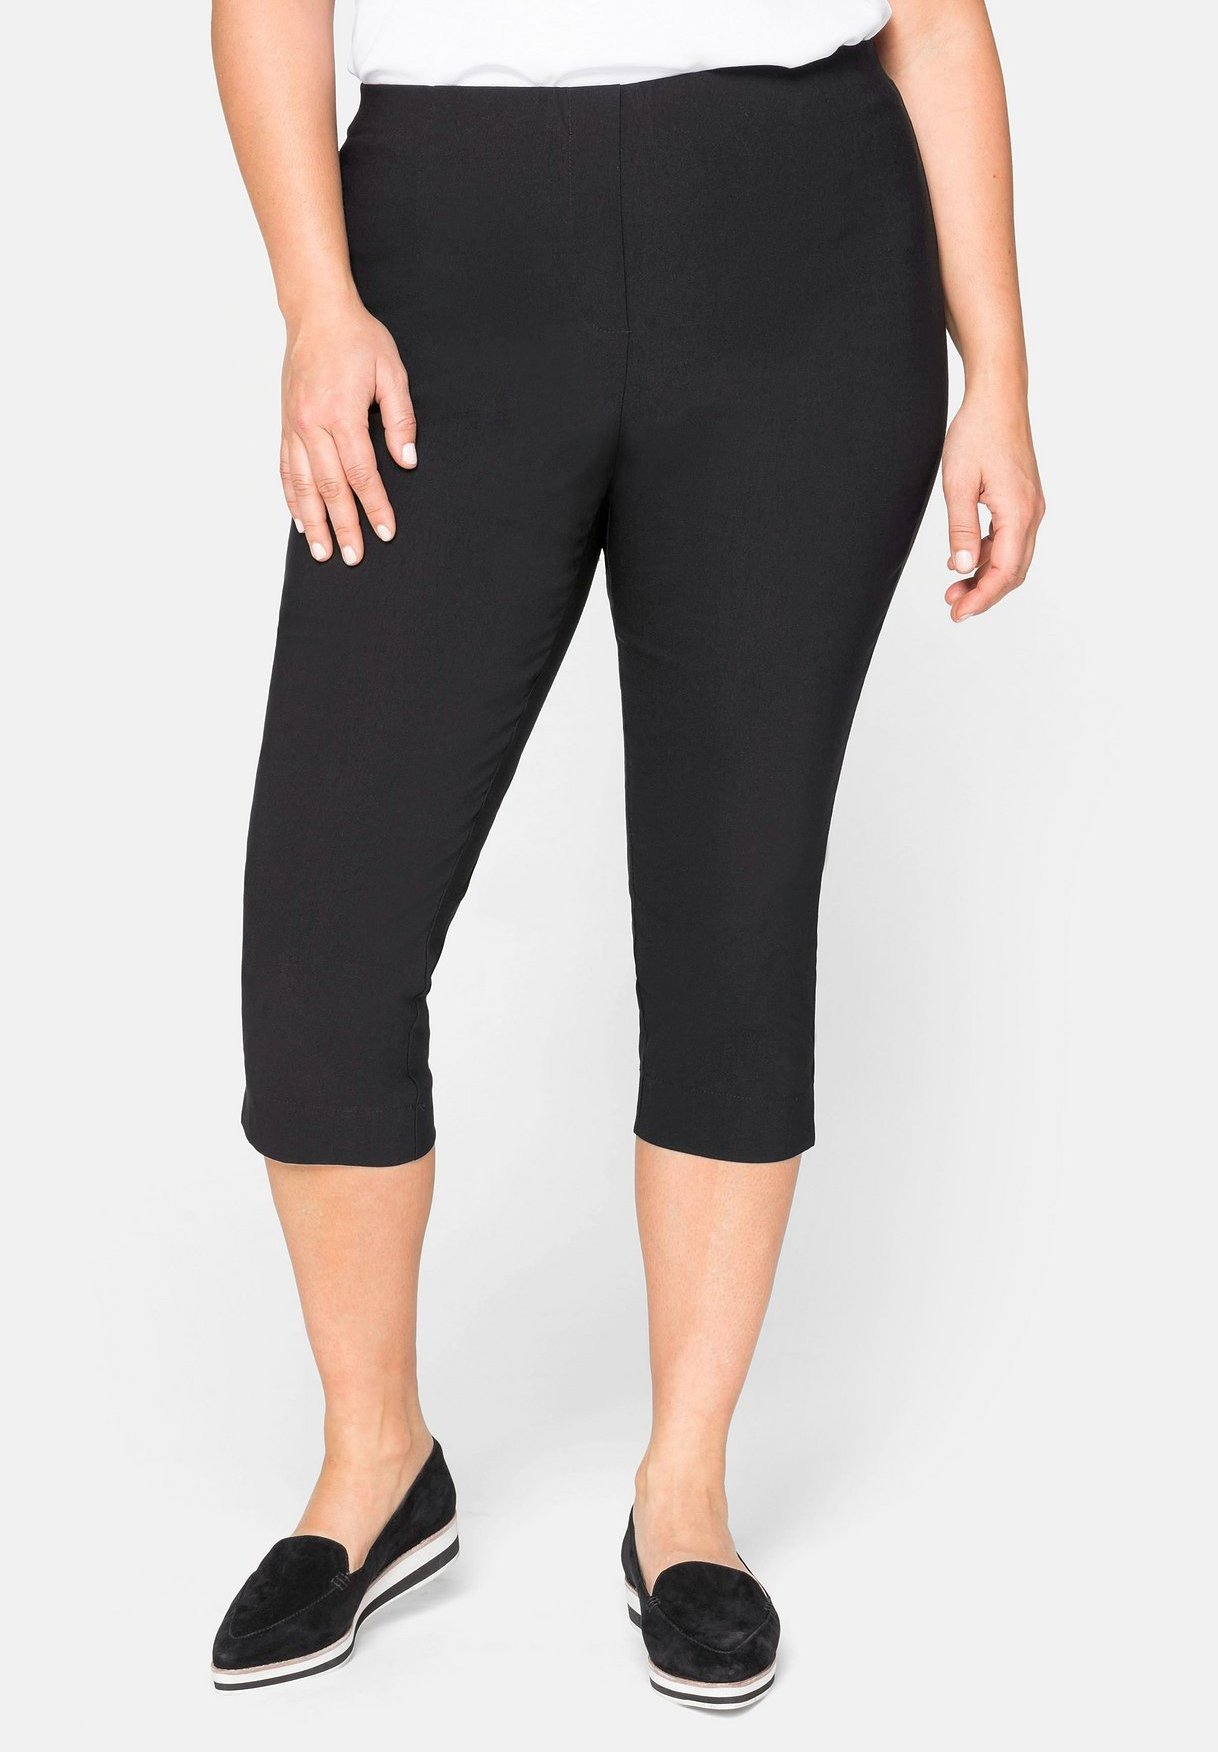 Damen BENGALIN - Leggings - Hosen